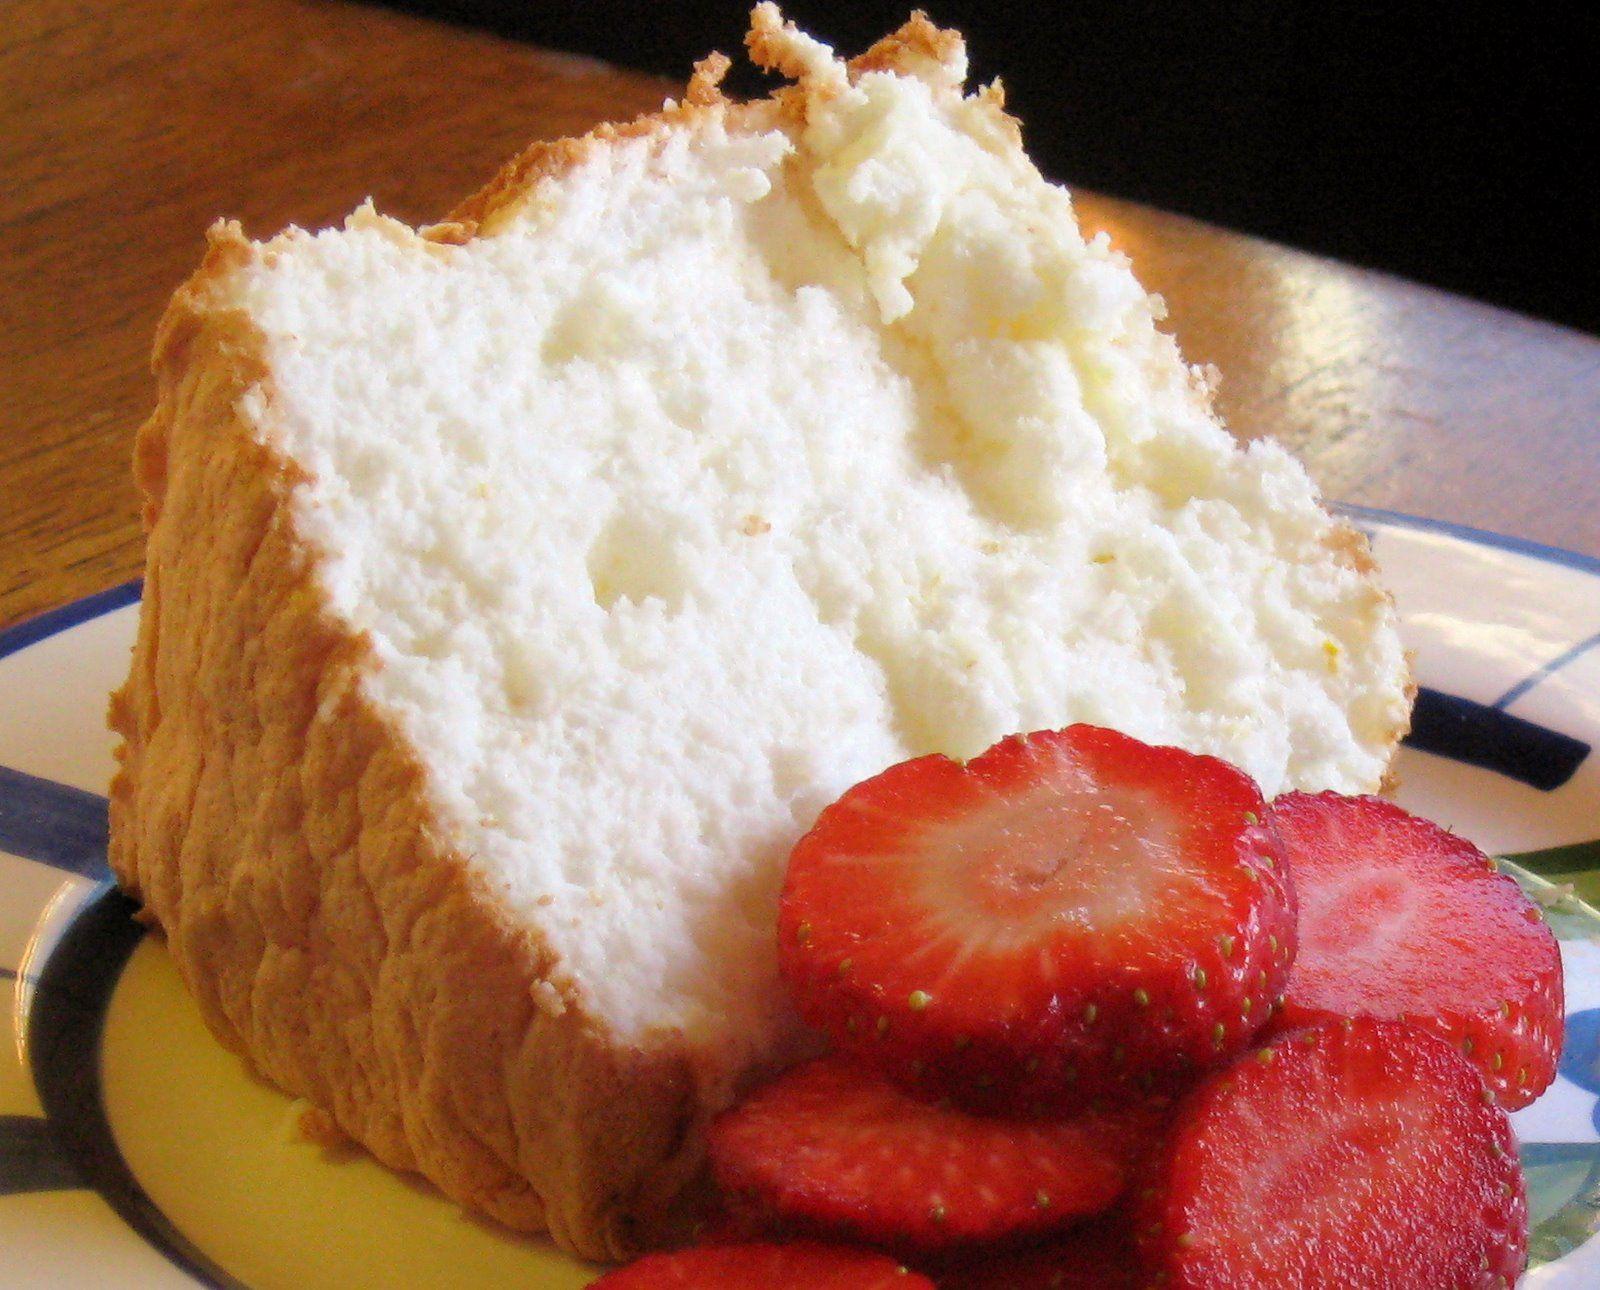 Gluten free lemon angel food cake recipe with images